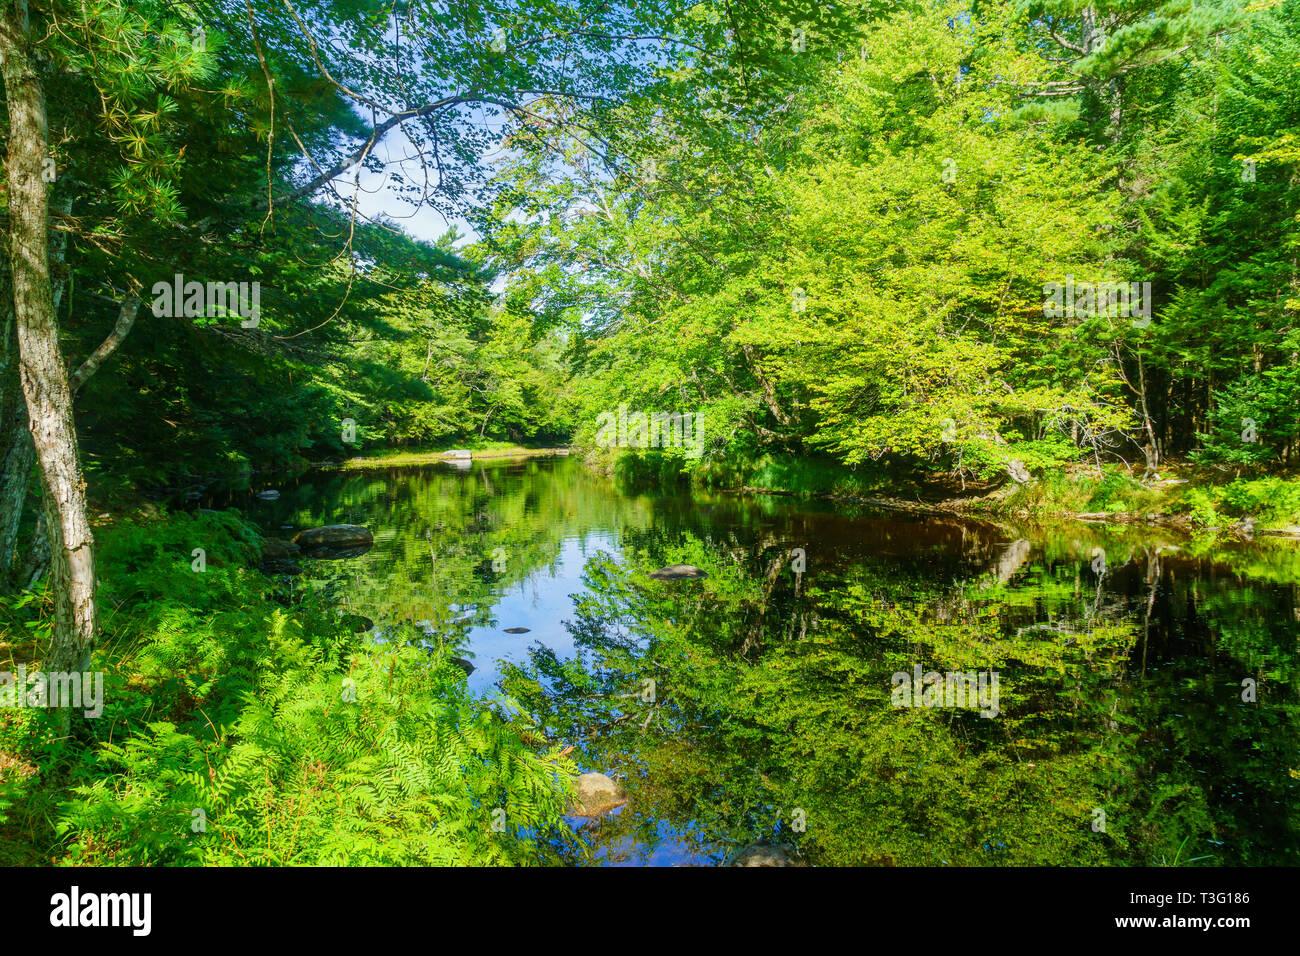 View of the Mersey river, in Kejimkujik National Park, Nova Scotia, Canada - Stock Image